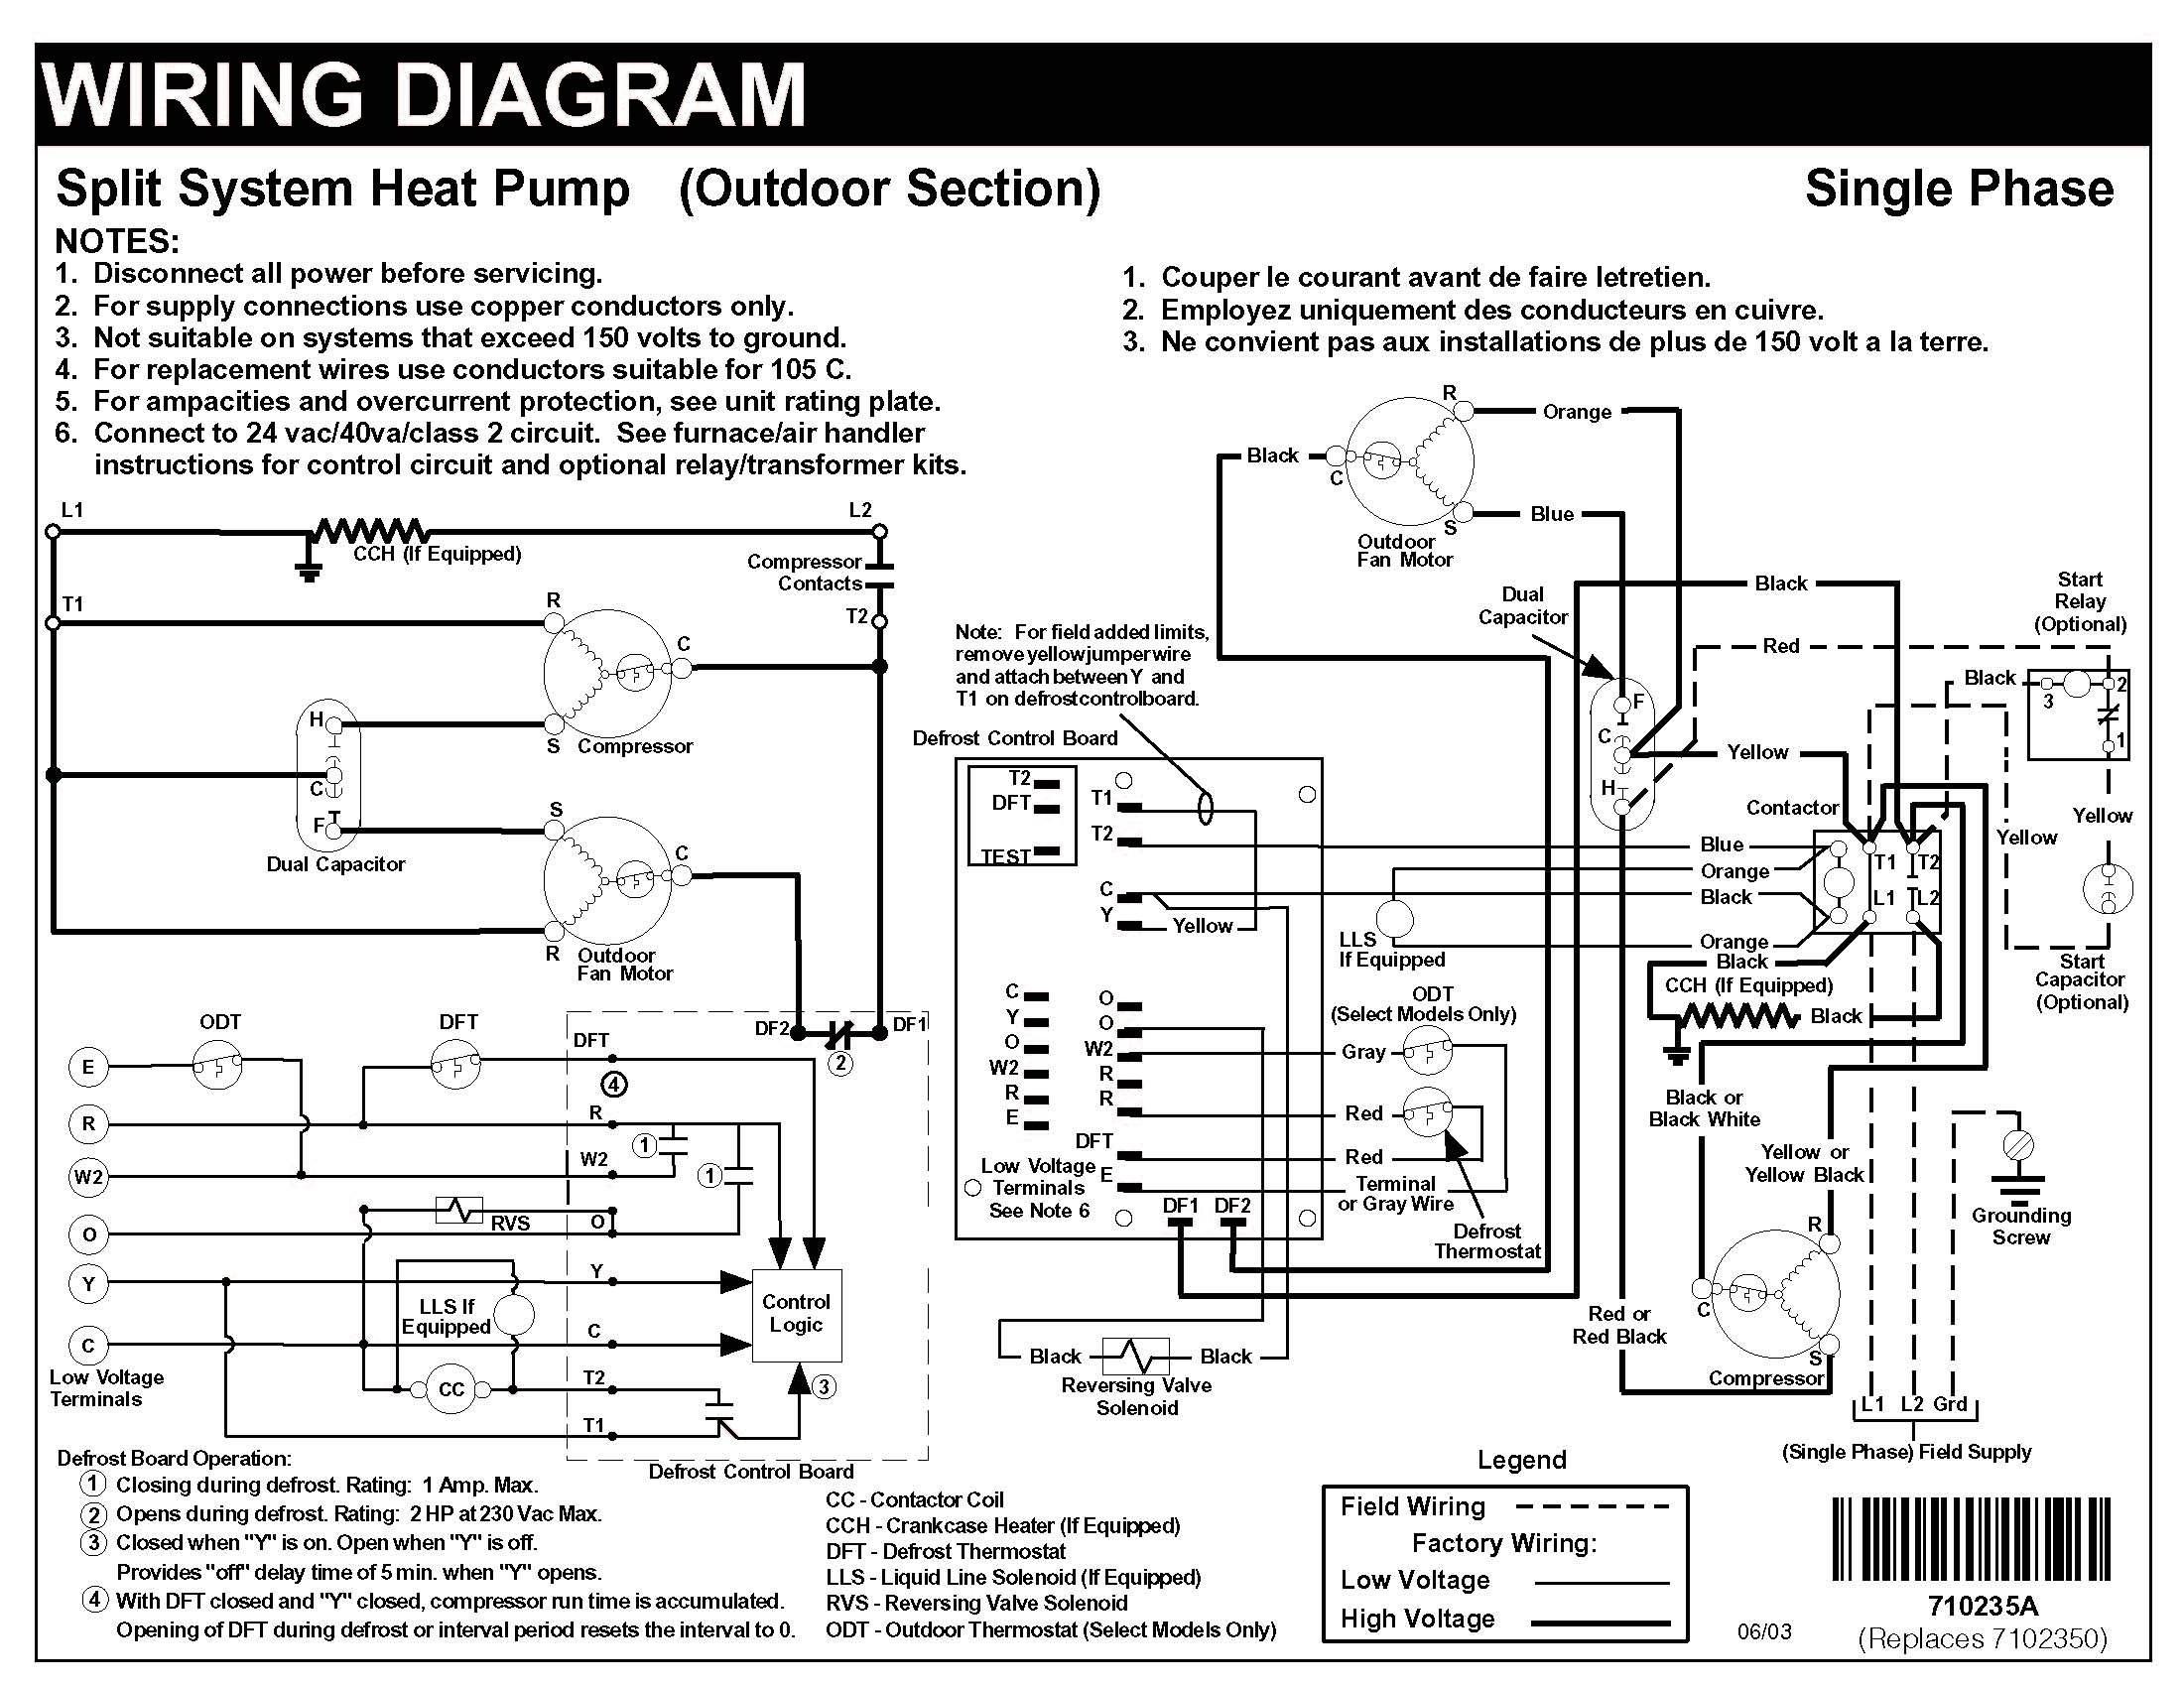 Carrier Heat Pump Wiring Schematic - Wiring Diagrams Hubs - Carrier Wiring Diagram